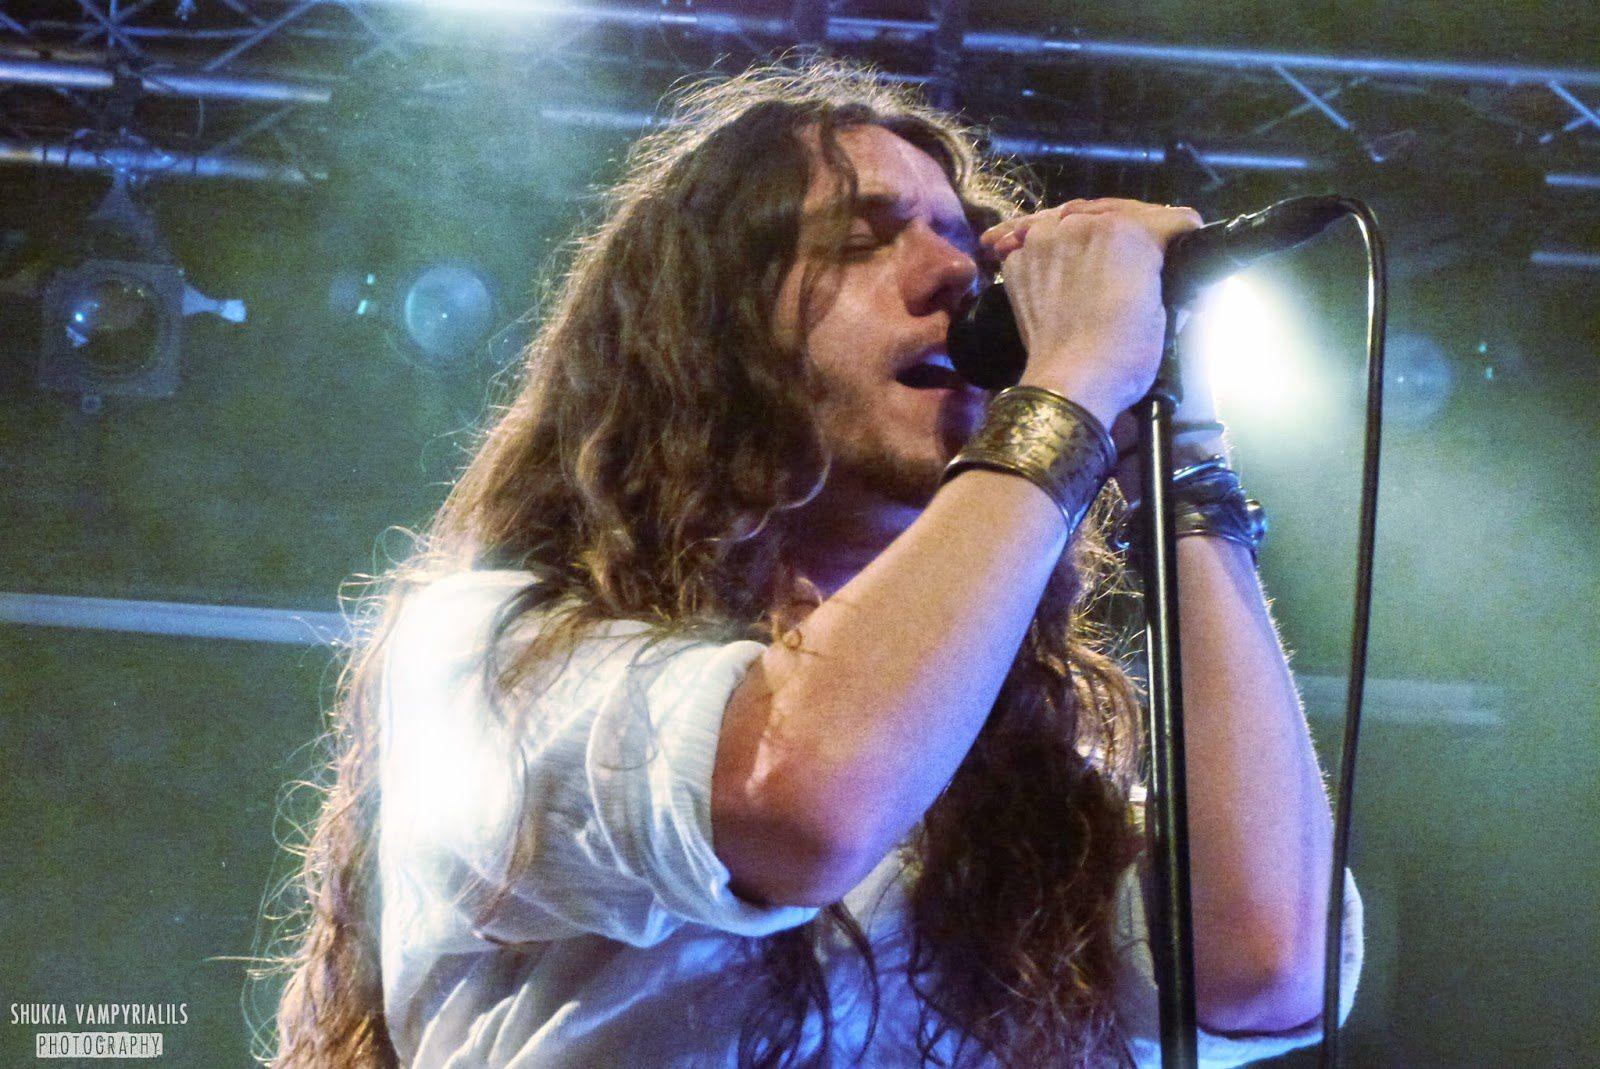 Andrew Hunt, vocalist of Buffalo Summer - credit: Shukia Vampyrialils Photography